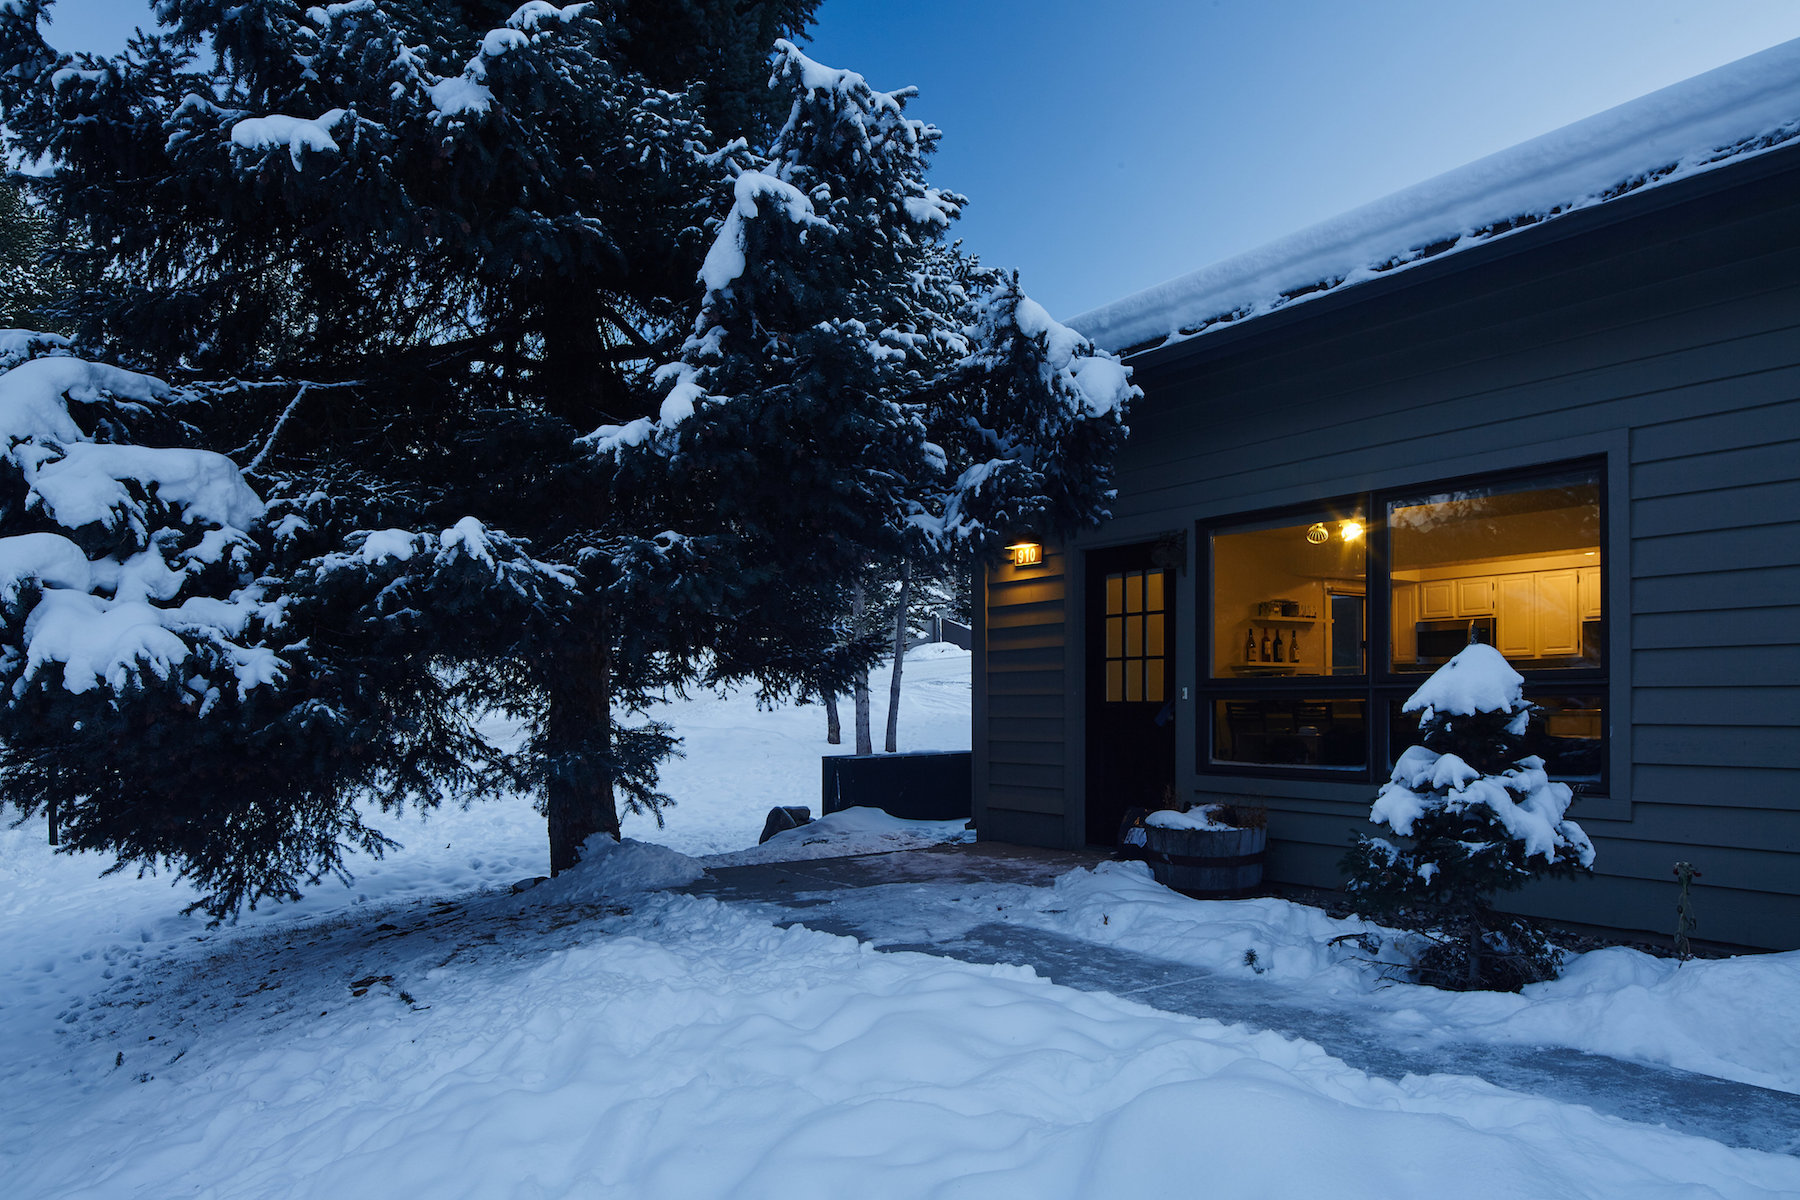 Condomínio para Venda às Hidden Village Condo 910 Sunburst Drive Big Sky, Montana 59716 Estados Unidos